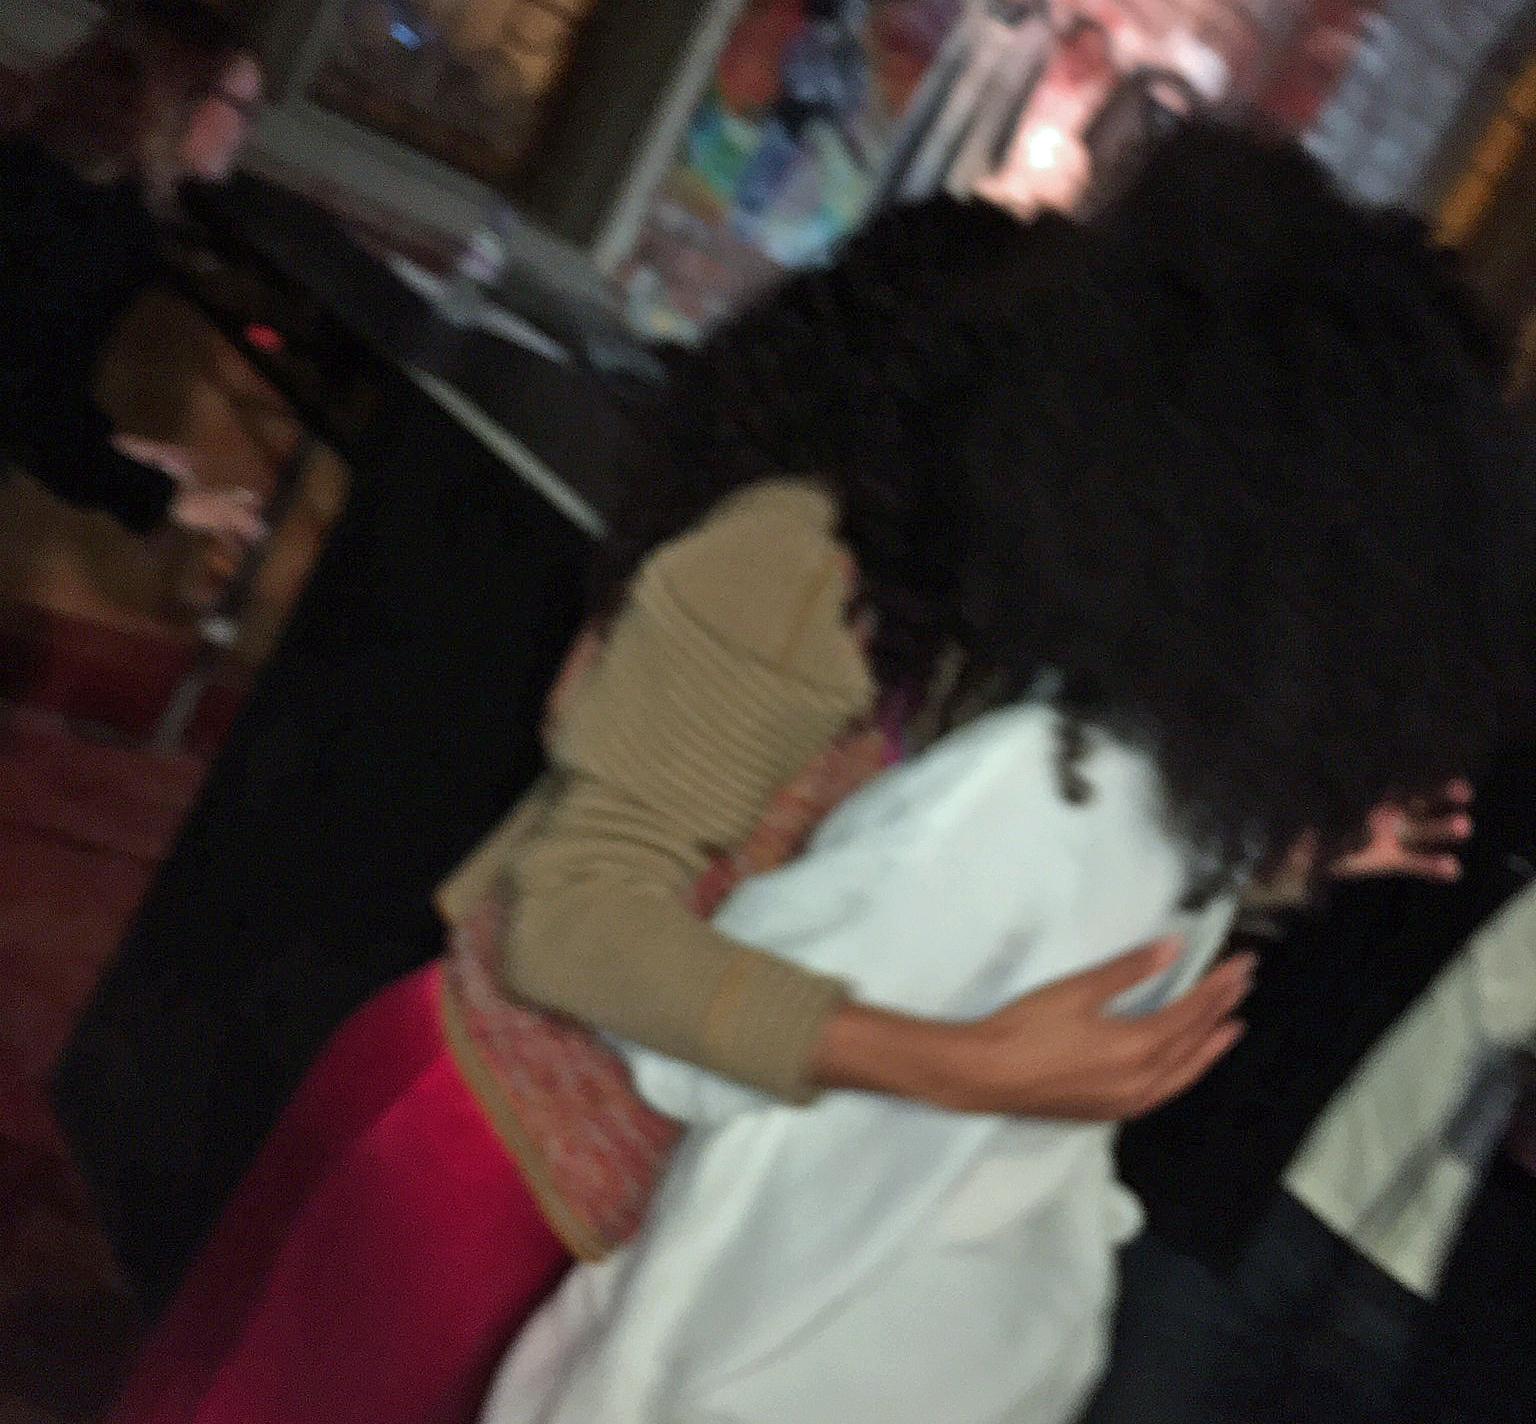 A blurry big hair hug from Corinne Bailey Rae